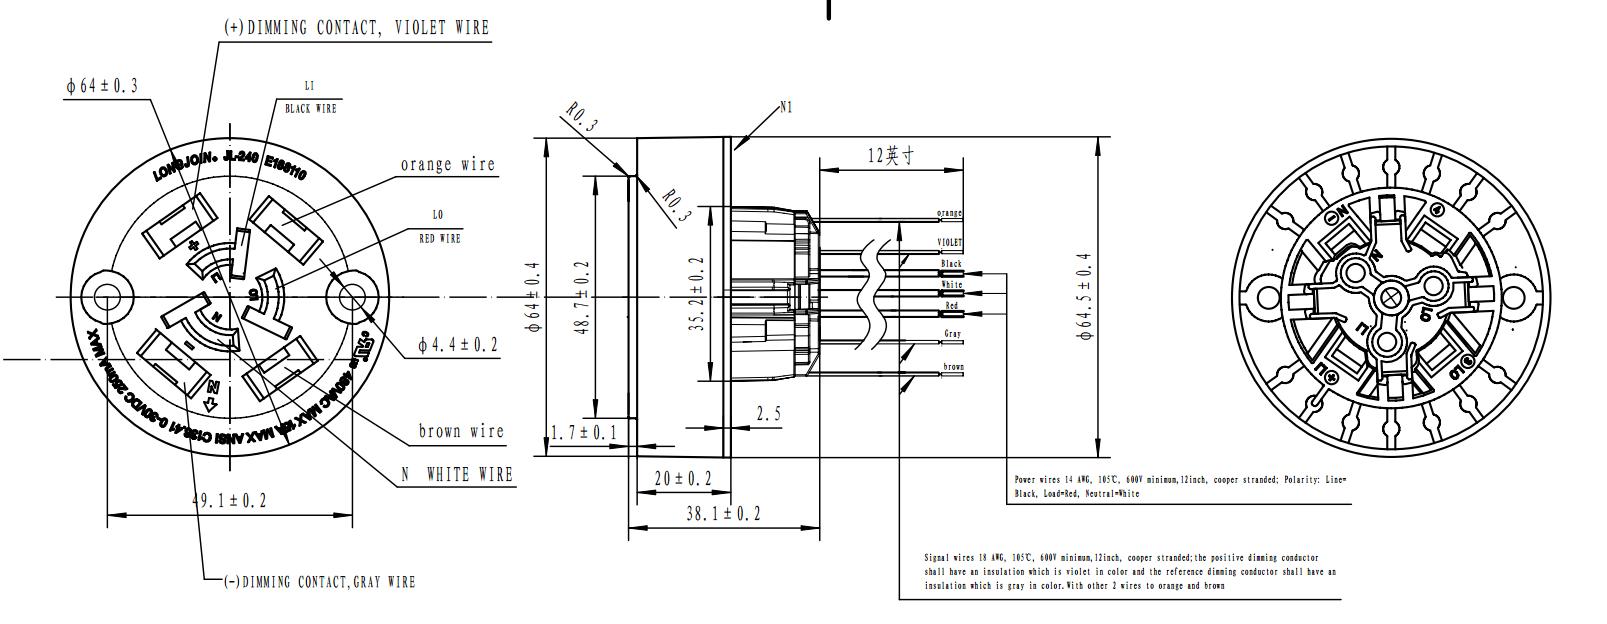 Nema 7pin 5pin Plug Photocontrol Receptacle Socket For Outdoor ... Nema Receptacle Wiring Diagram Pin on l6-30r receptacle wiring-diagram, standard receptacle wiring-diagram, l5-30r receptacle wiring-diagram, nema 14-50r wiring-diagram, nema twist plug and receptacle chart, 50 amp receptacle wiring-diagram, nema l14-30p wiring-diagram, nema 10-30r wiring-diagram,